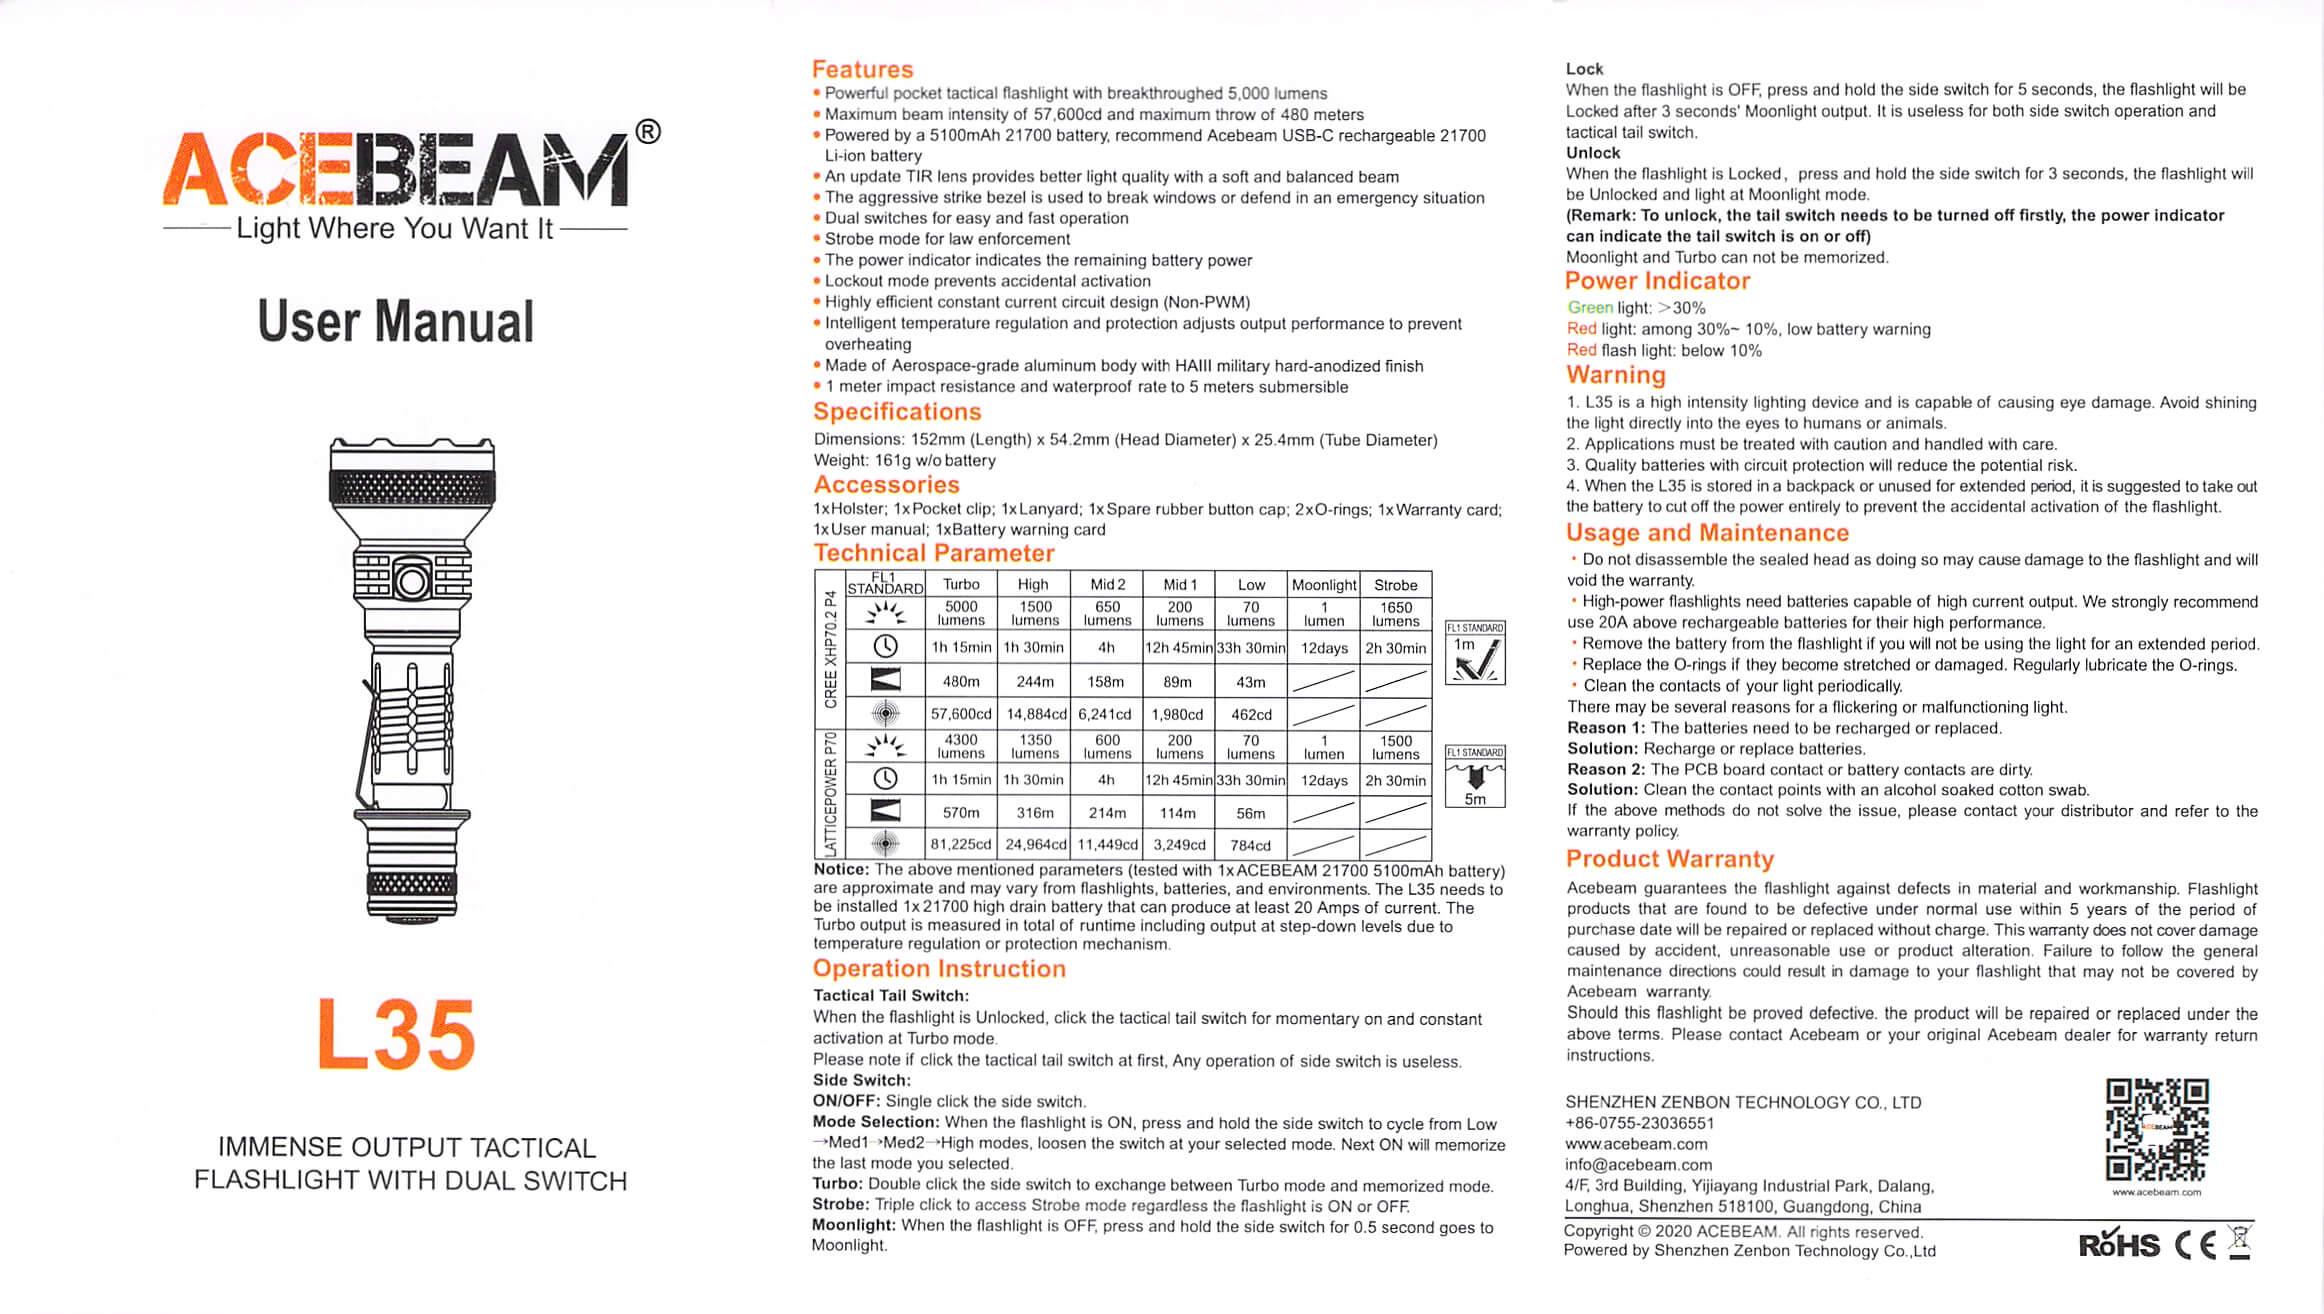 Acebeam L35 flashlight manual